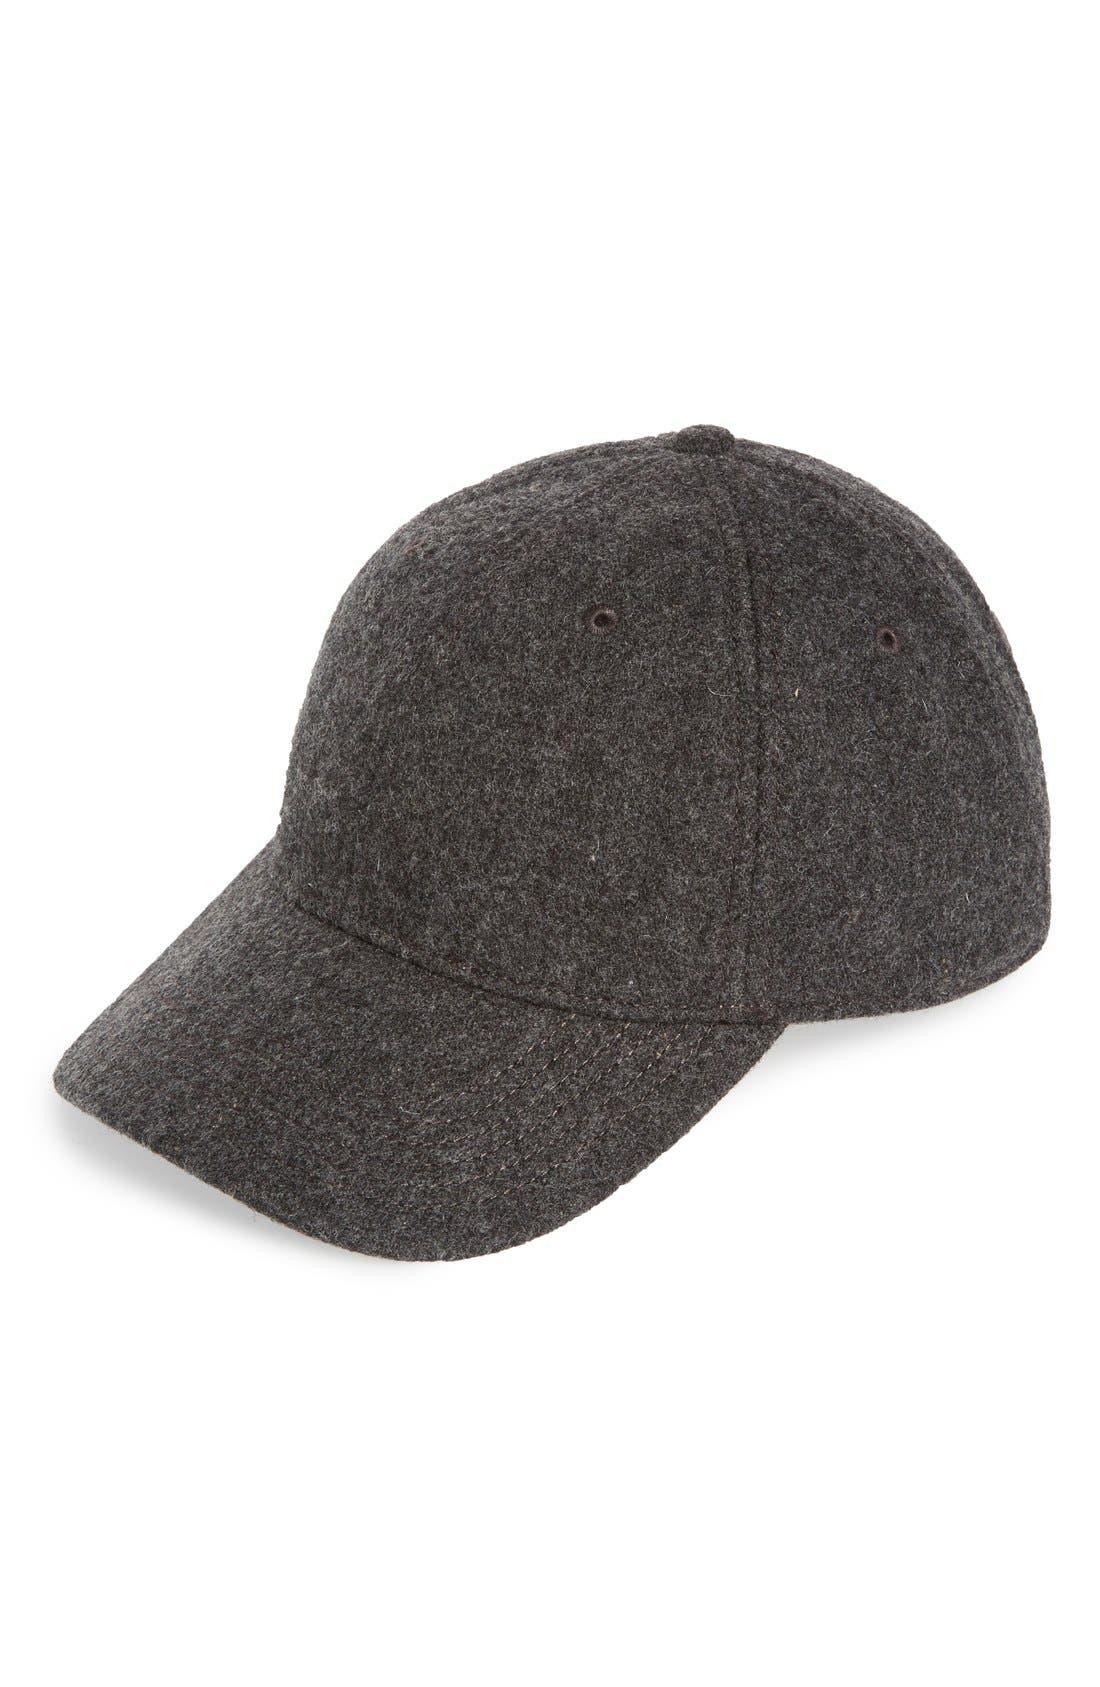 Wool Blend Baseball Cap,                             Main thumbnail 1, color,                             020